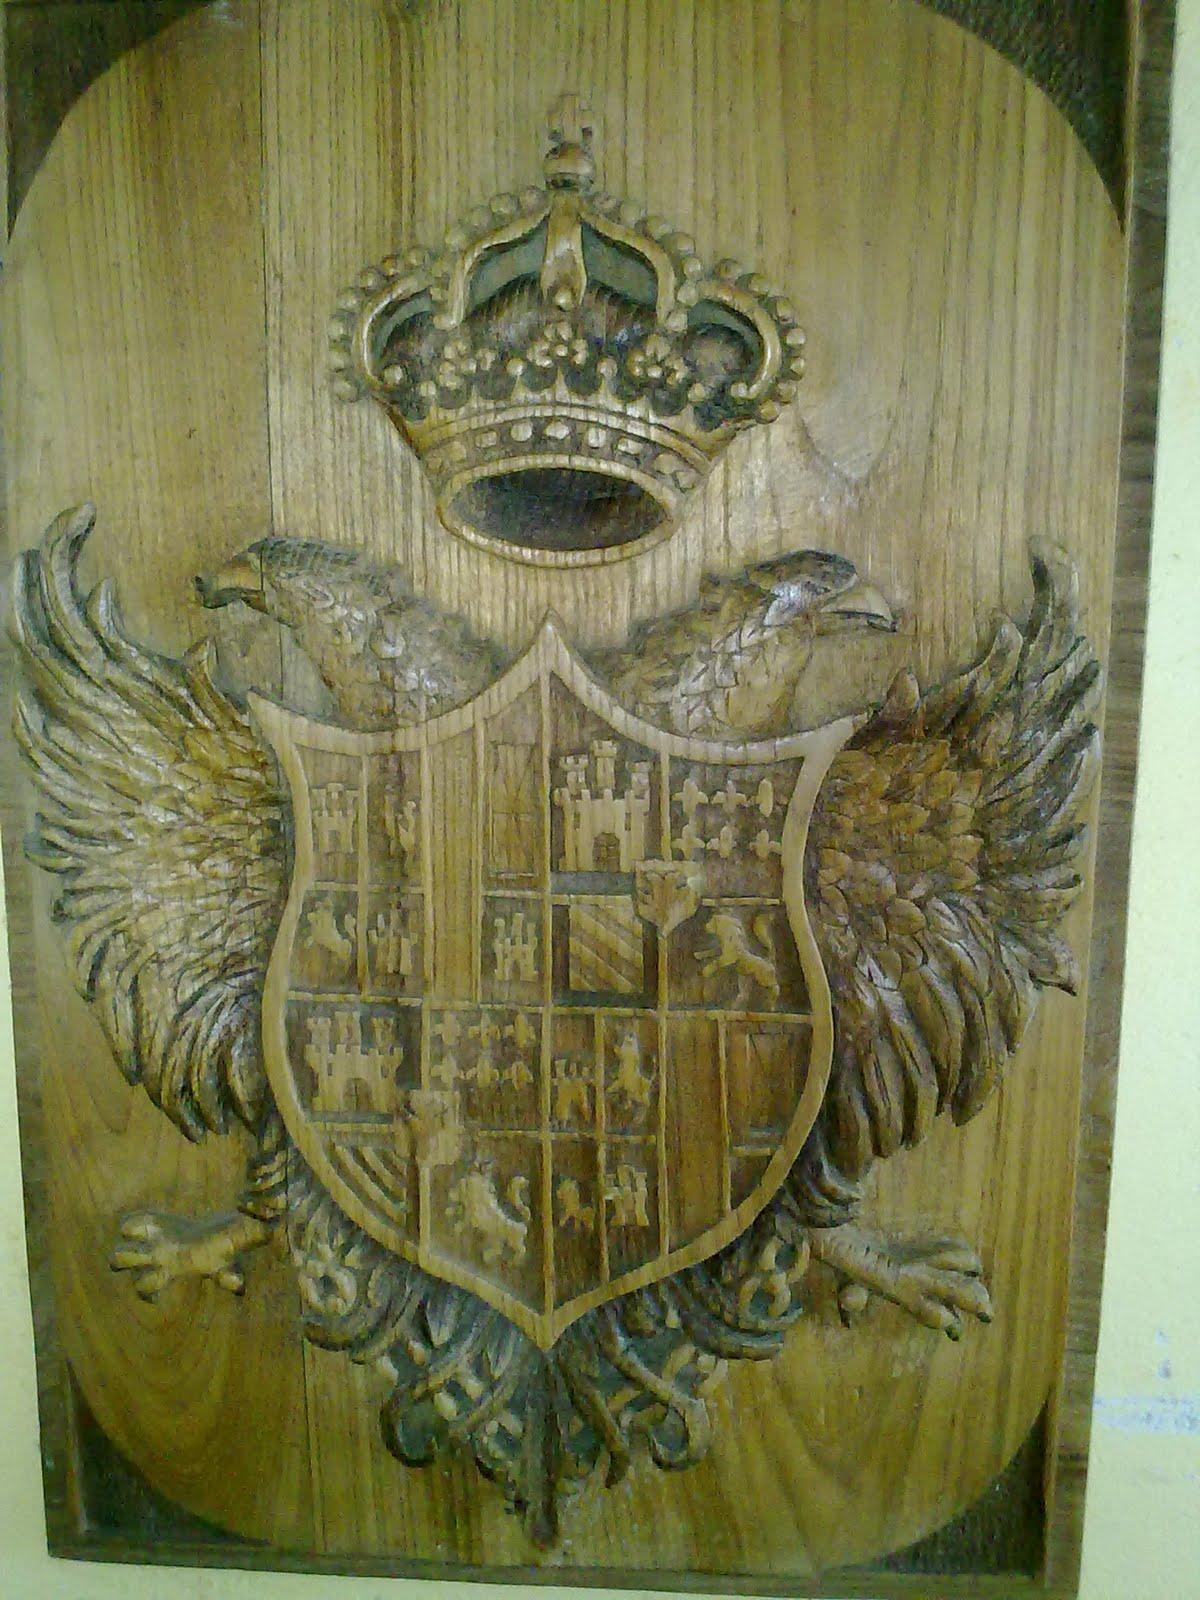 Arteinterior tallas en madera de casta o - Madera de castano ...